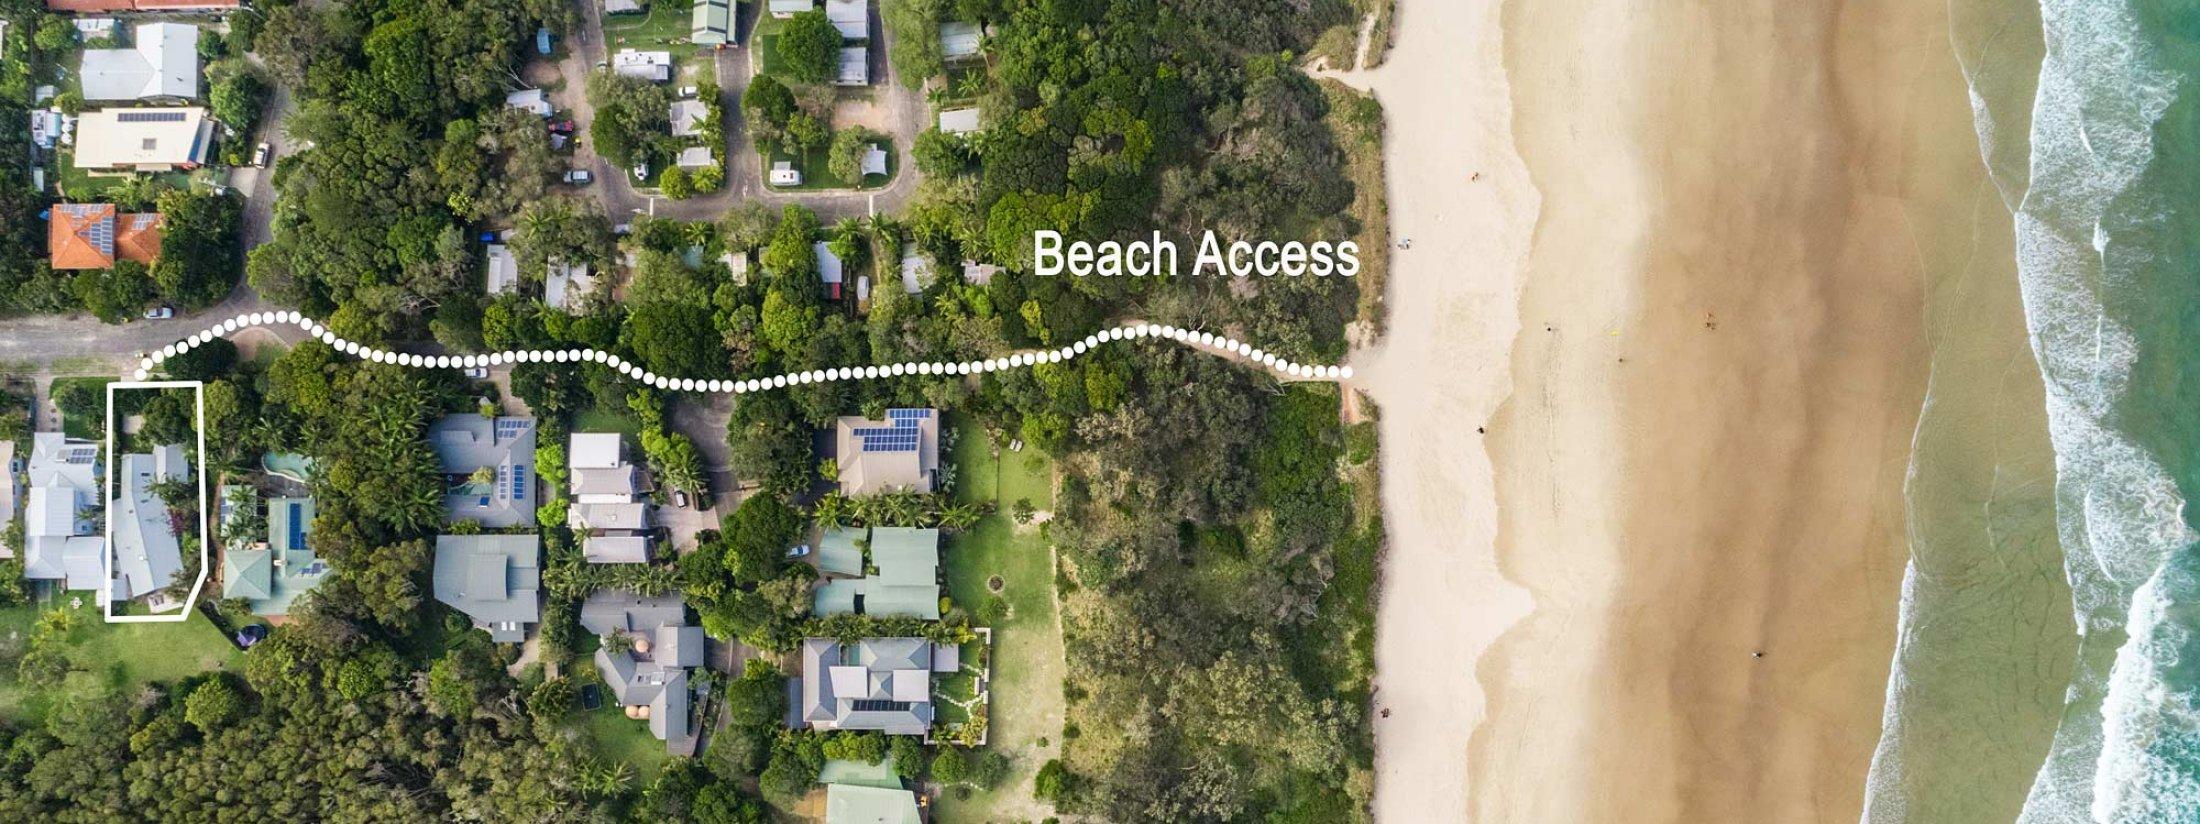 Beachwood - Byron Bay - Aerial Straight Down with Path to Beach